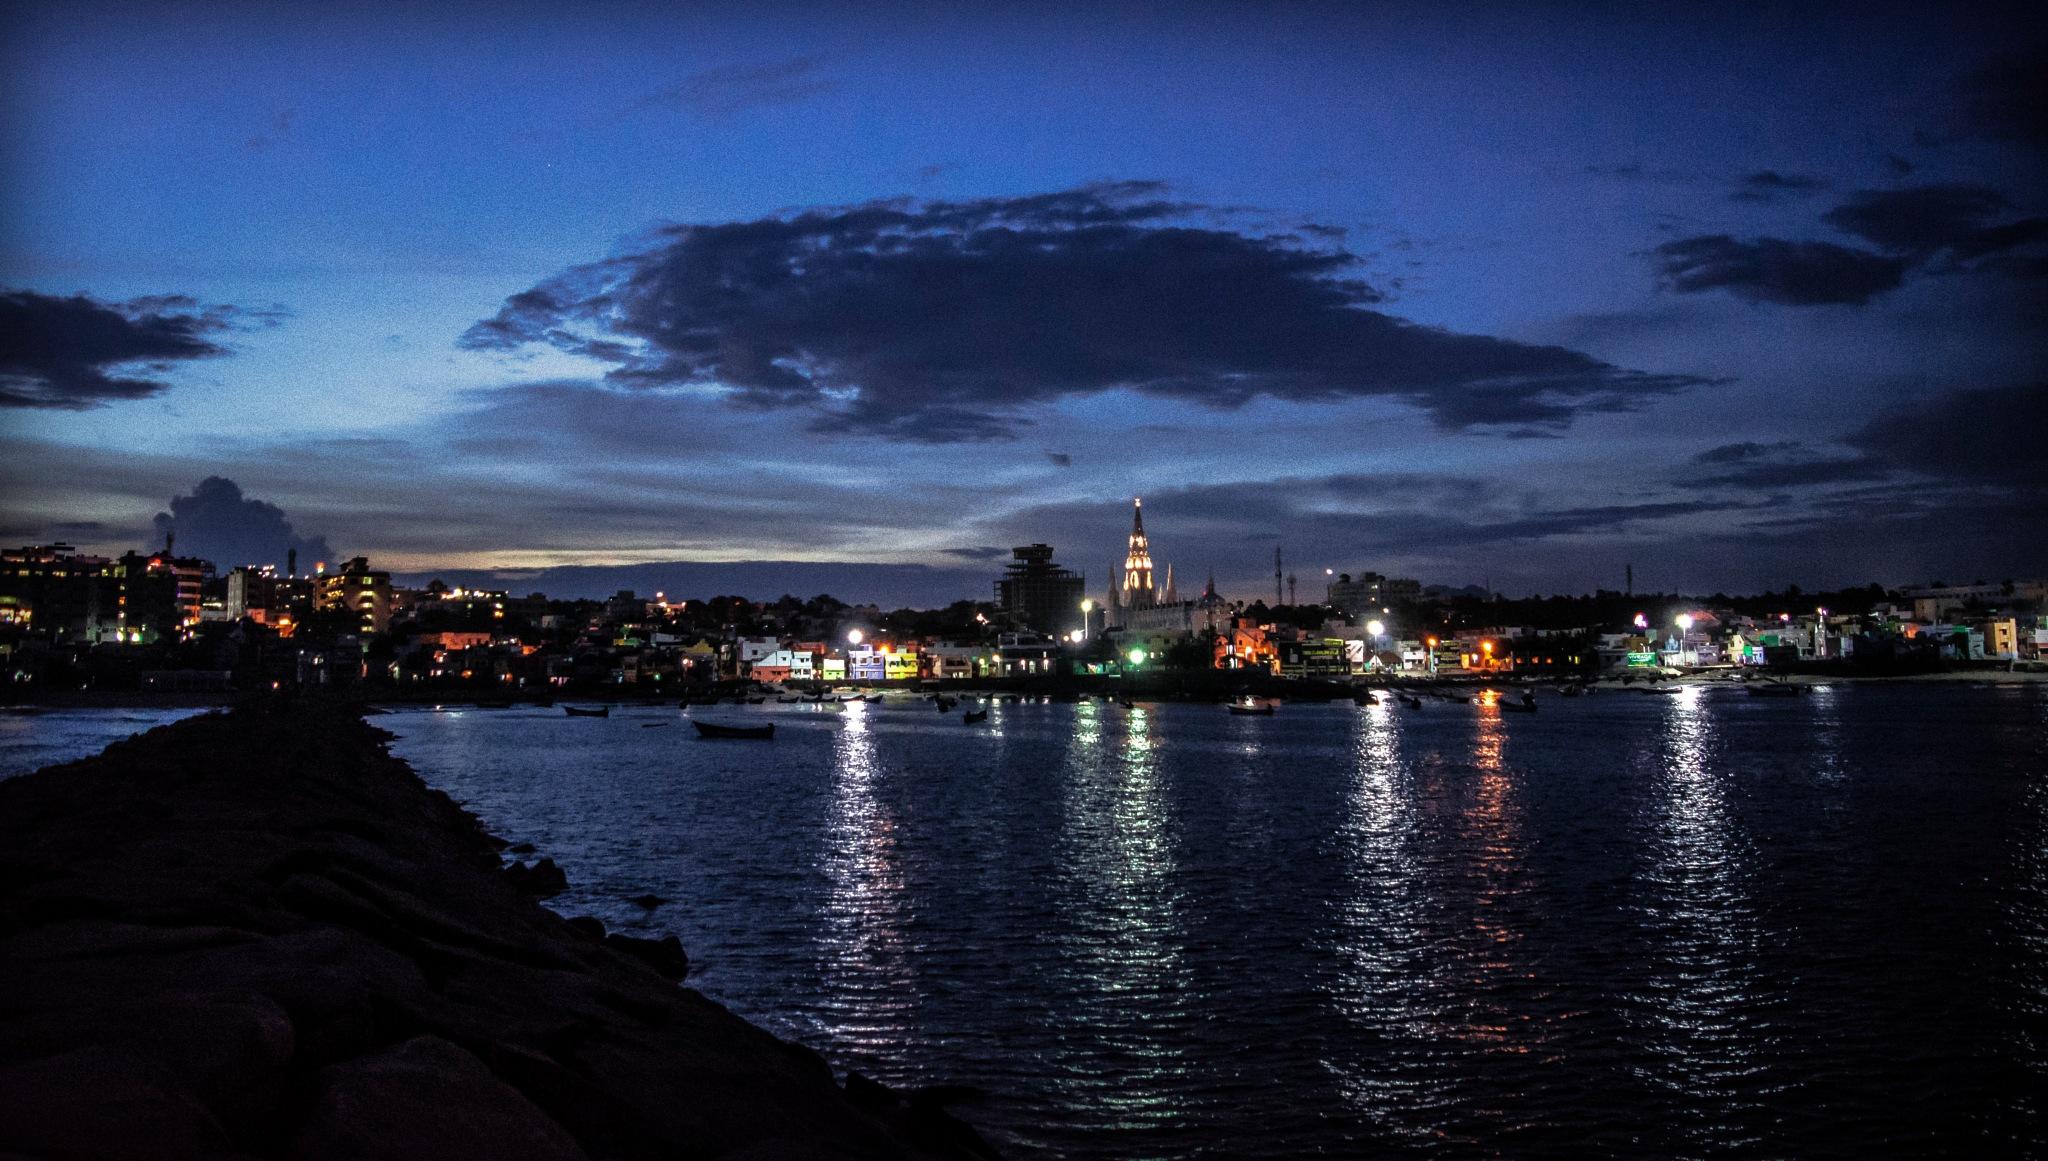 Evening @ Kanyakumari by Nayrrit Das